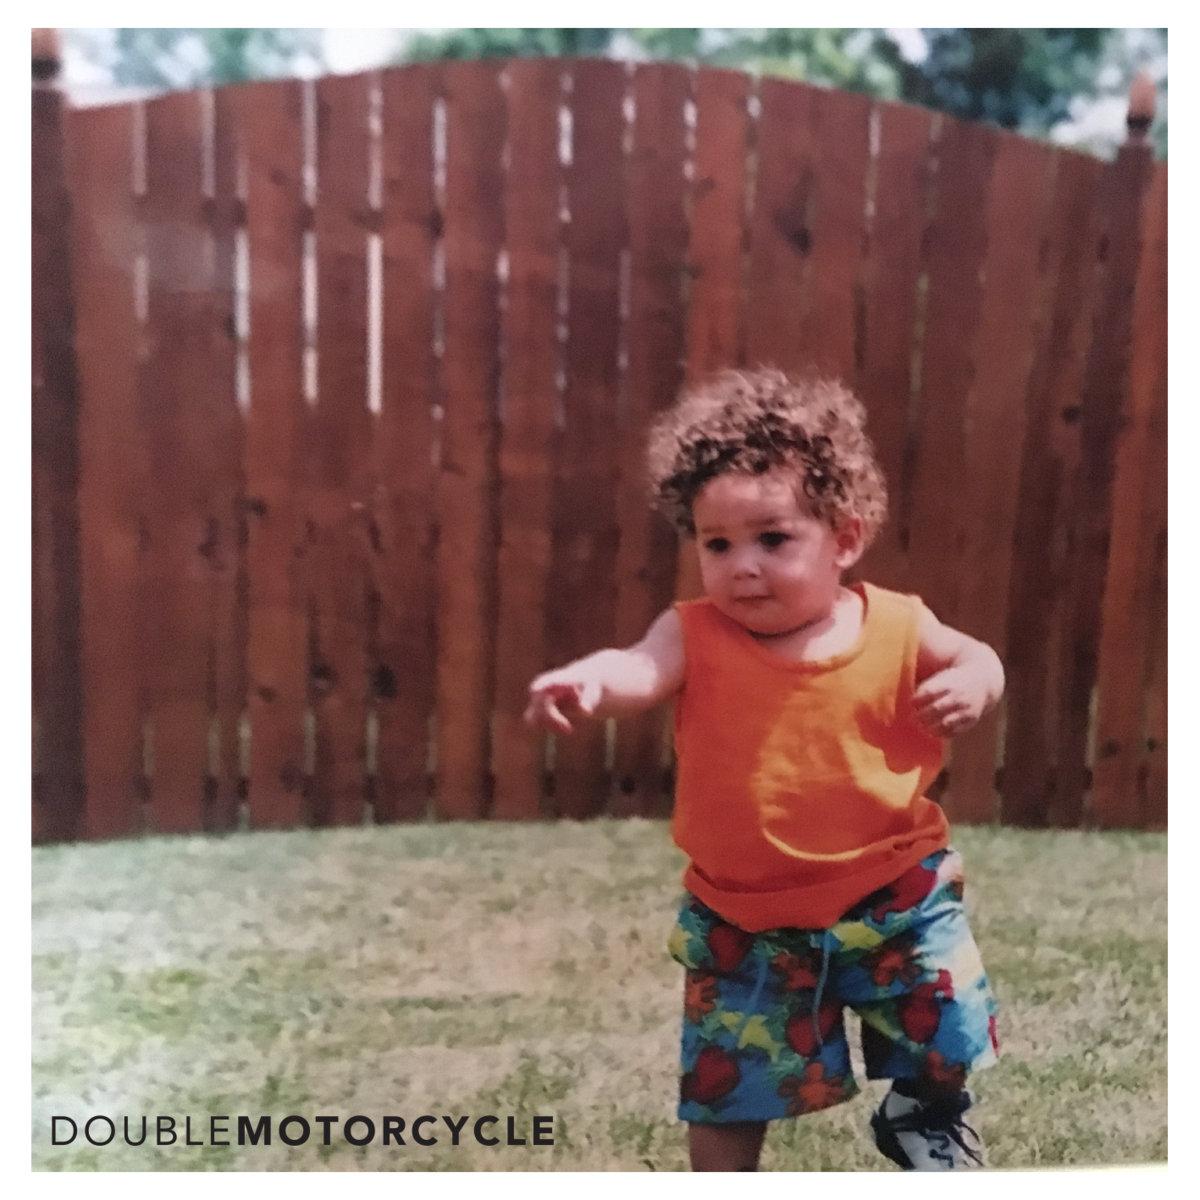 DoubleMotorcycle